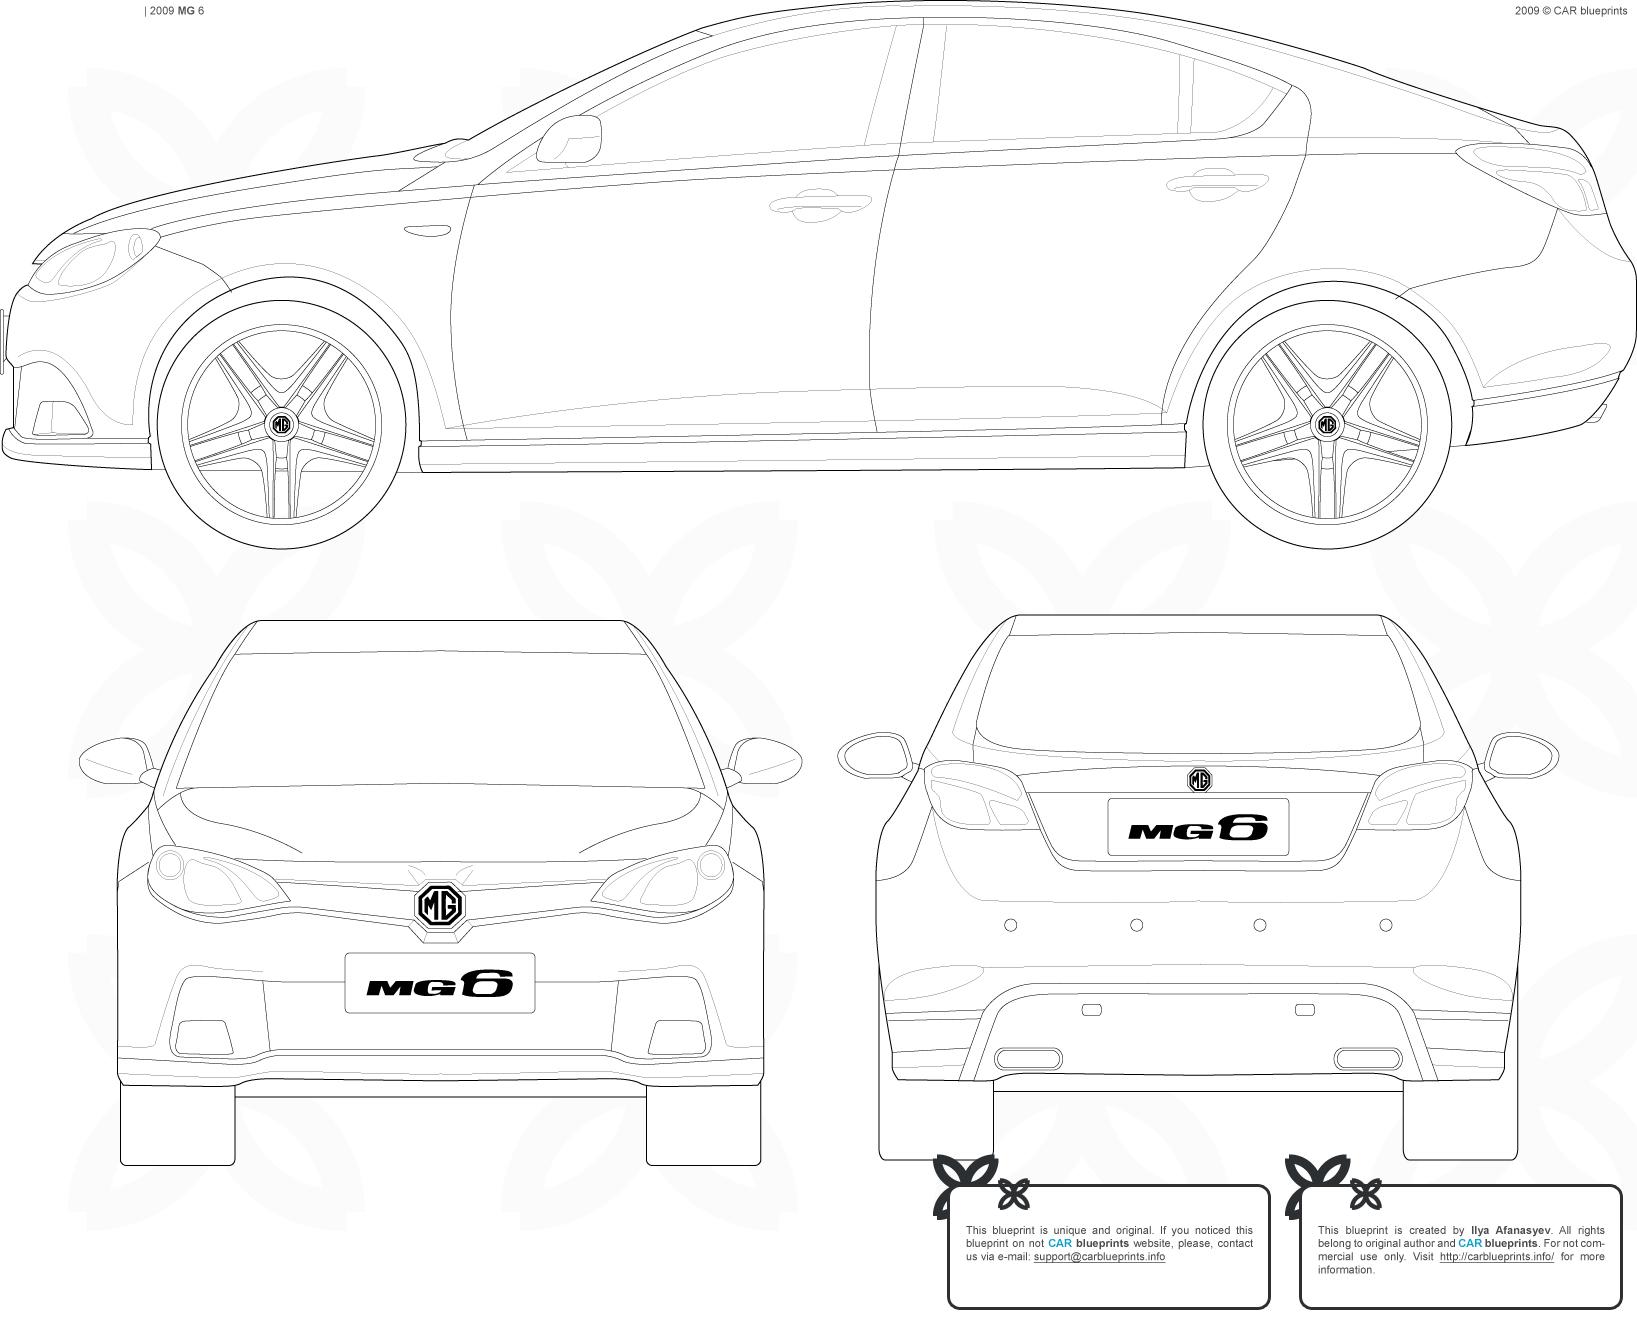 MG 6 blueprints